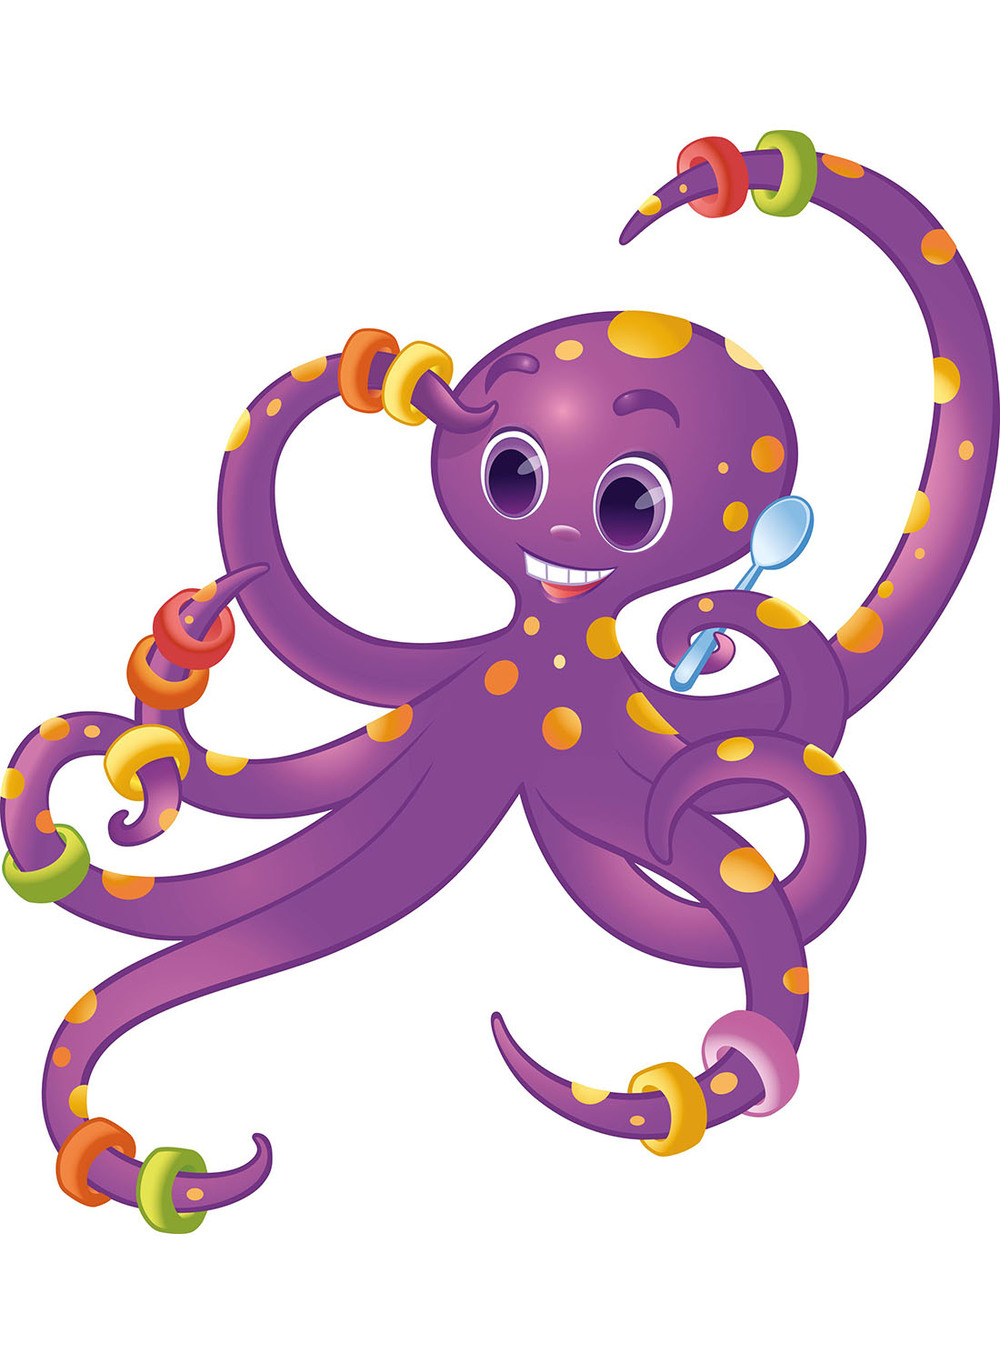 Coles Octopus